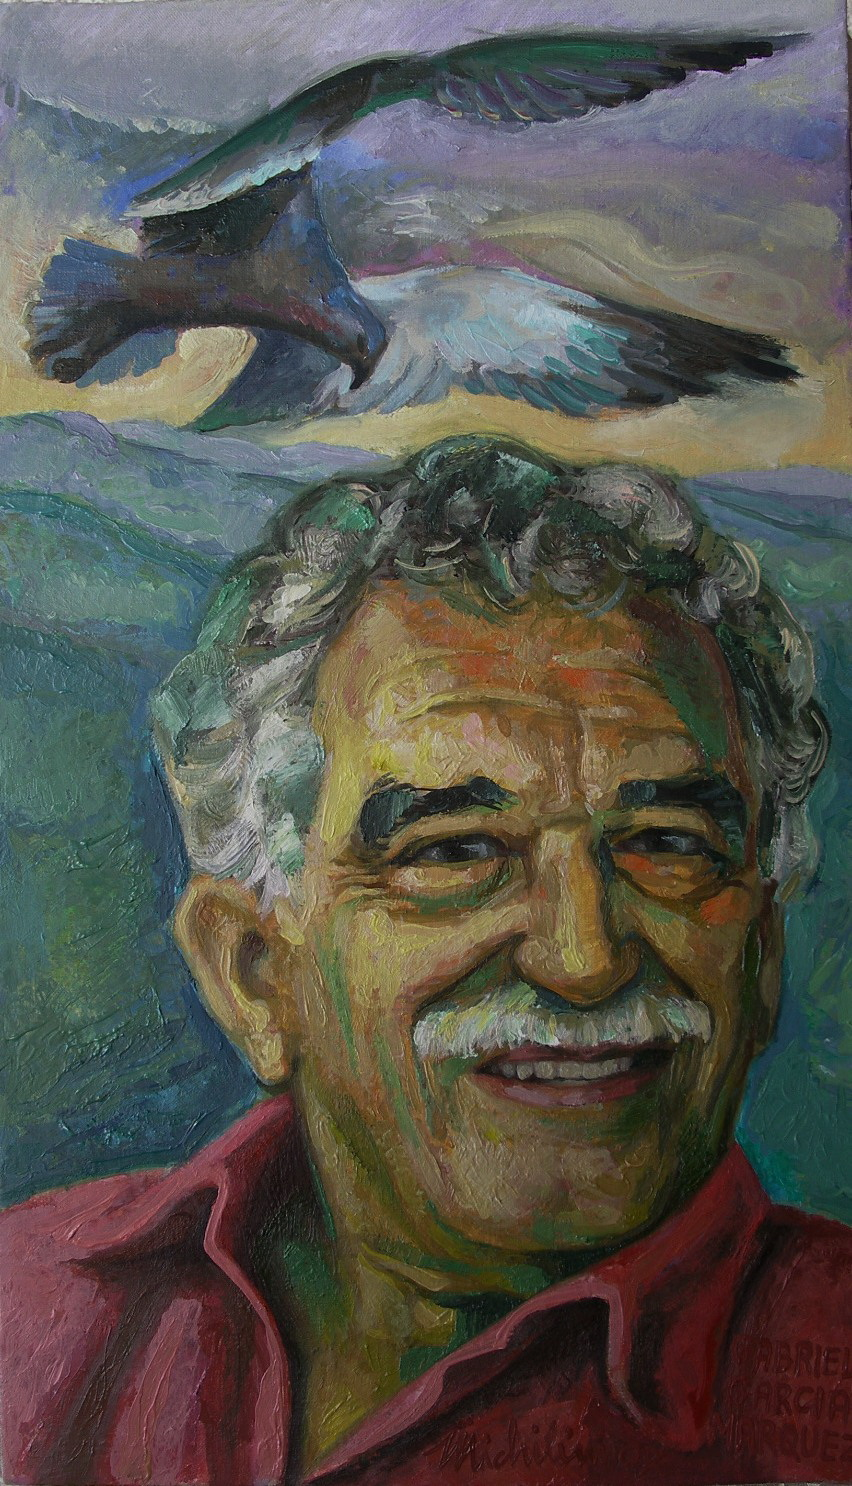 Sergio Michilini, GABRIEL GARCIA MARQUEZ, 2007, cm.60x35, olio su tela